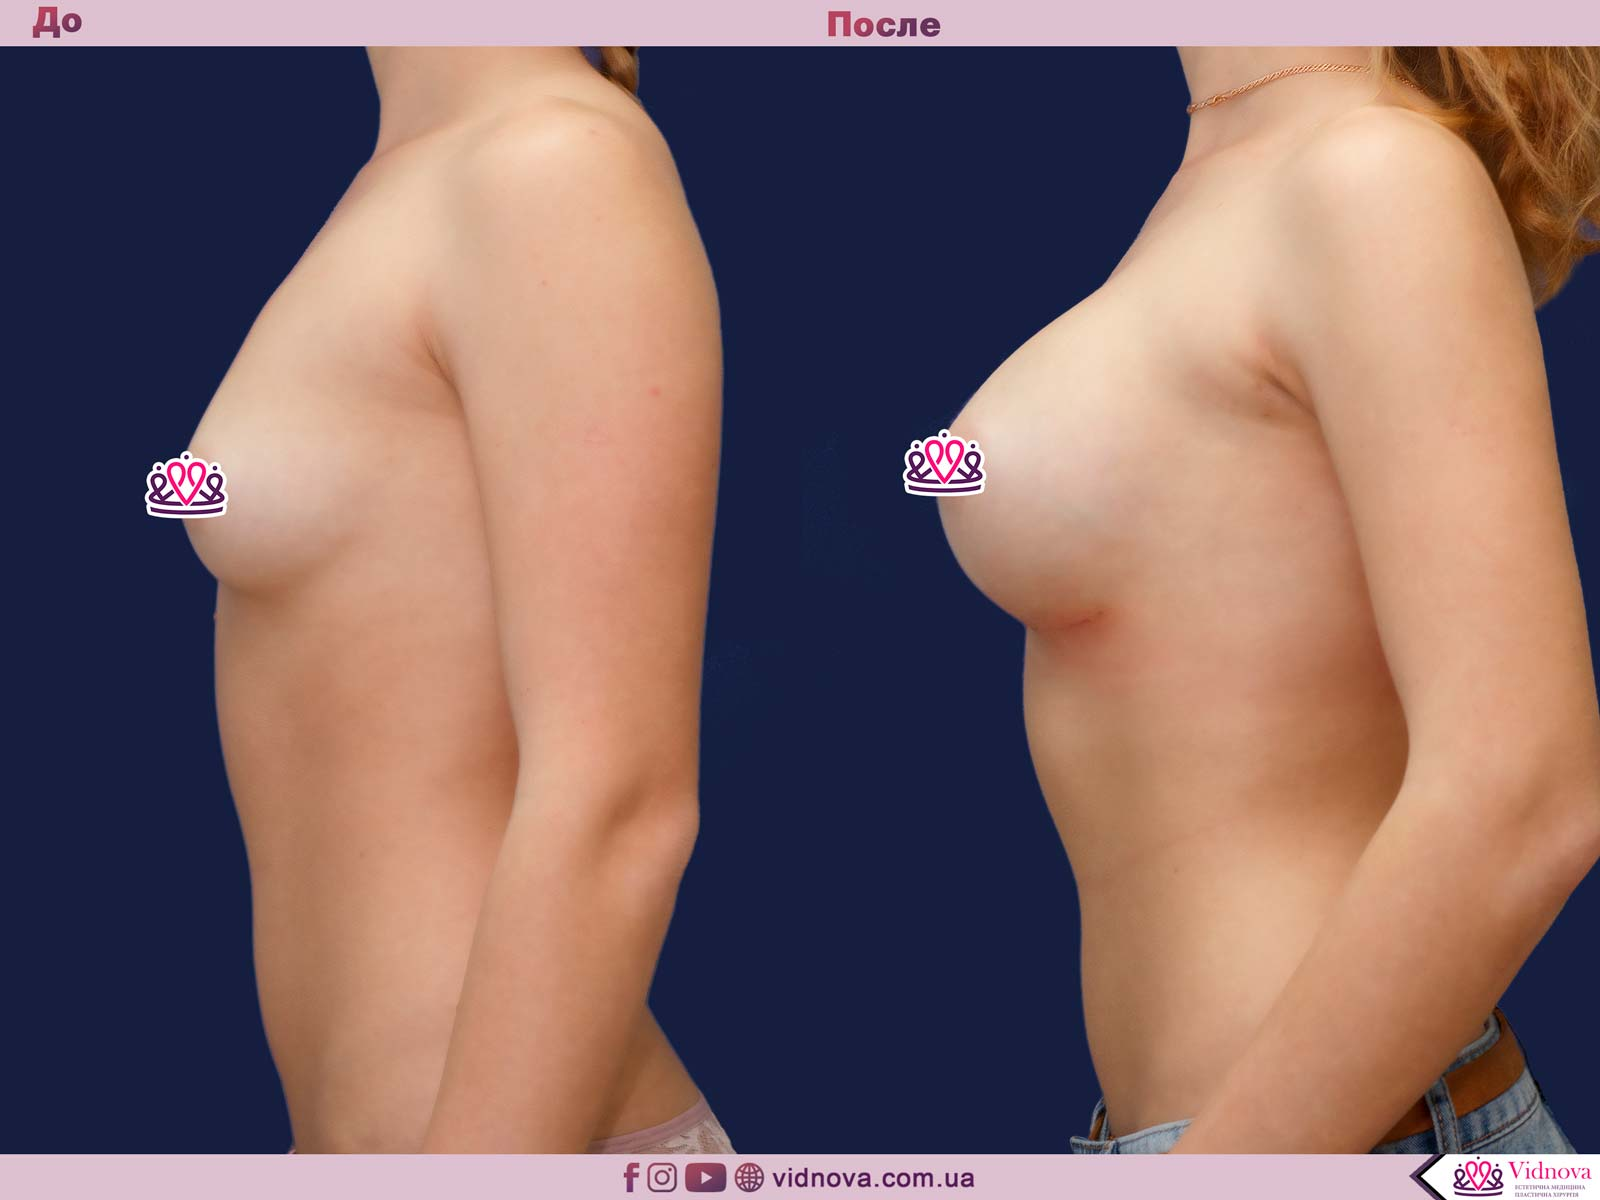 Увеличение груди: Фото ДО и ПОСЛЕ - Пример №66-3 - Клиника Vidnova